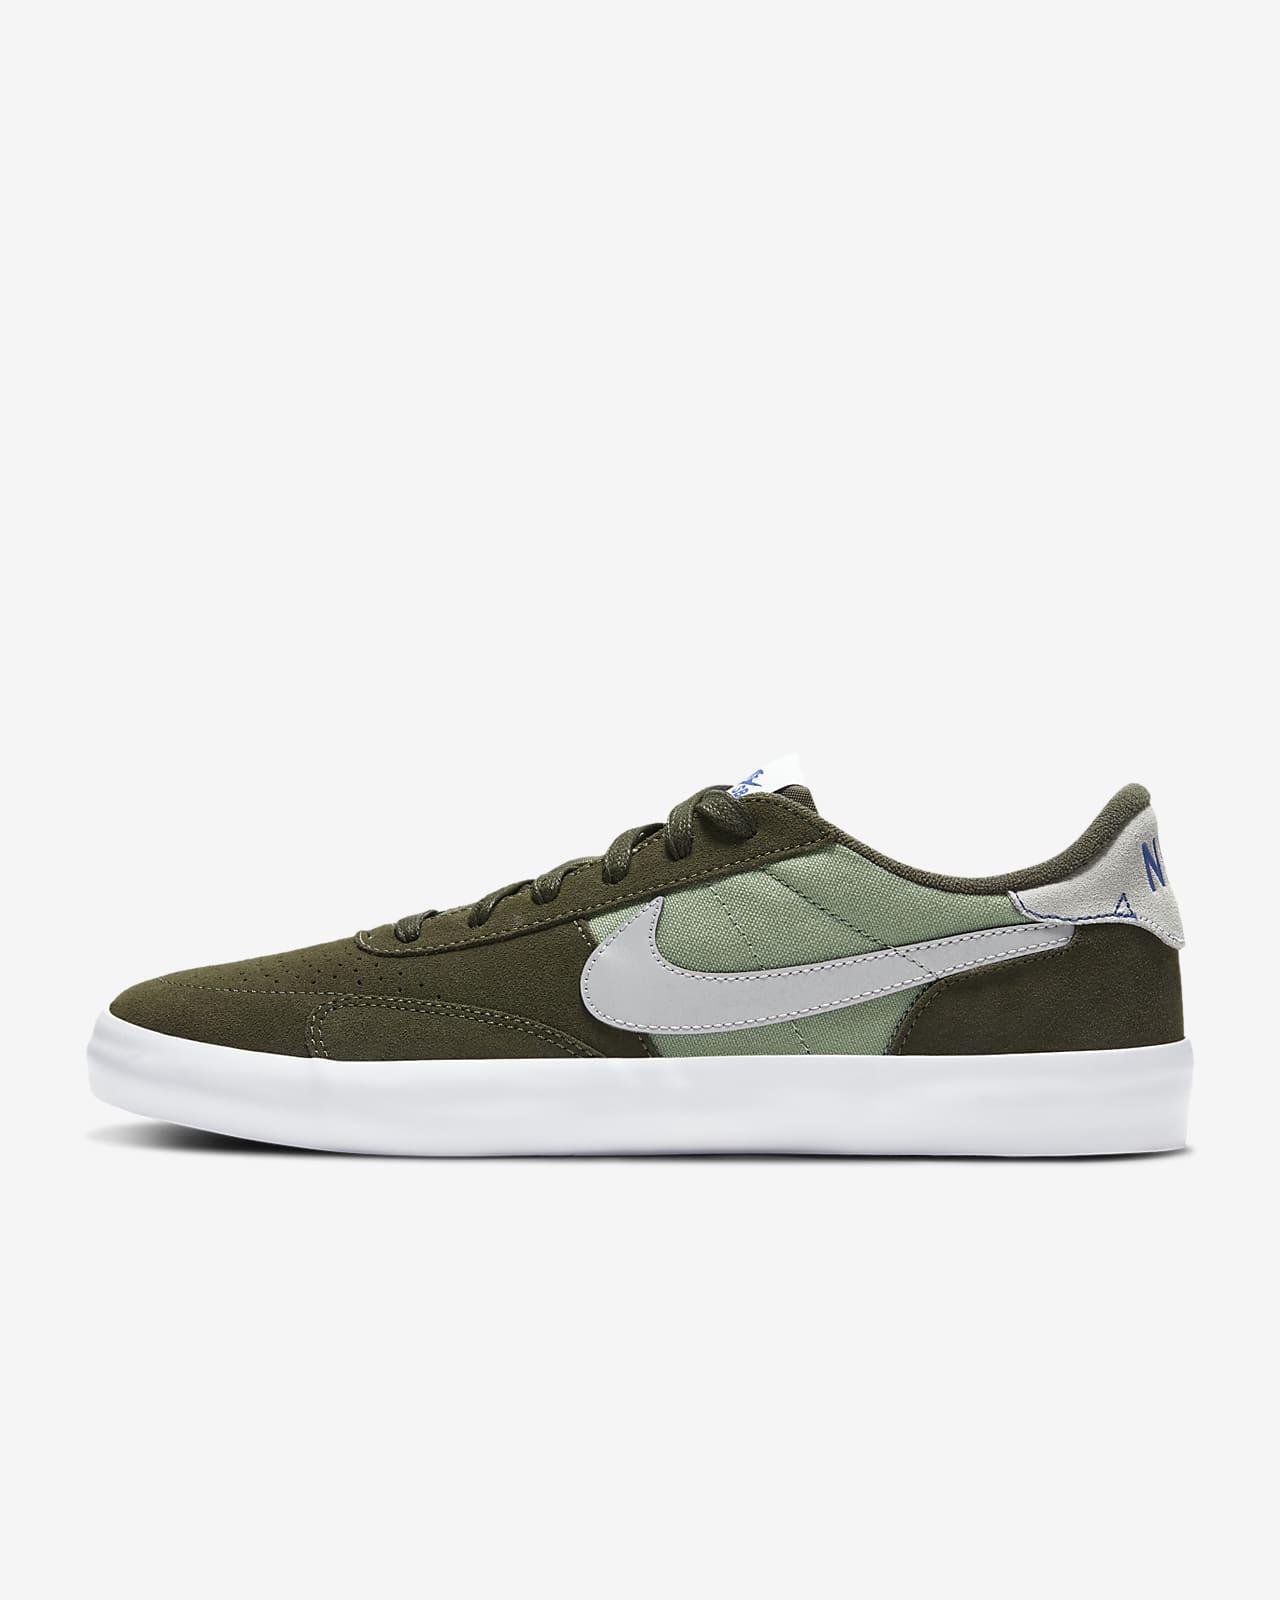 Chaussure de skateboard Nike SB Heritage Vulc Premium